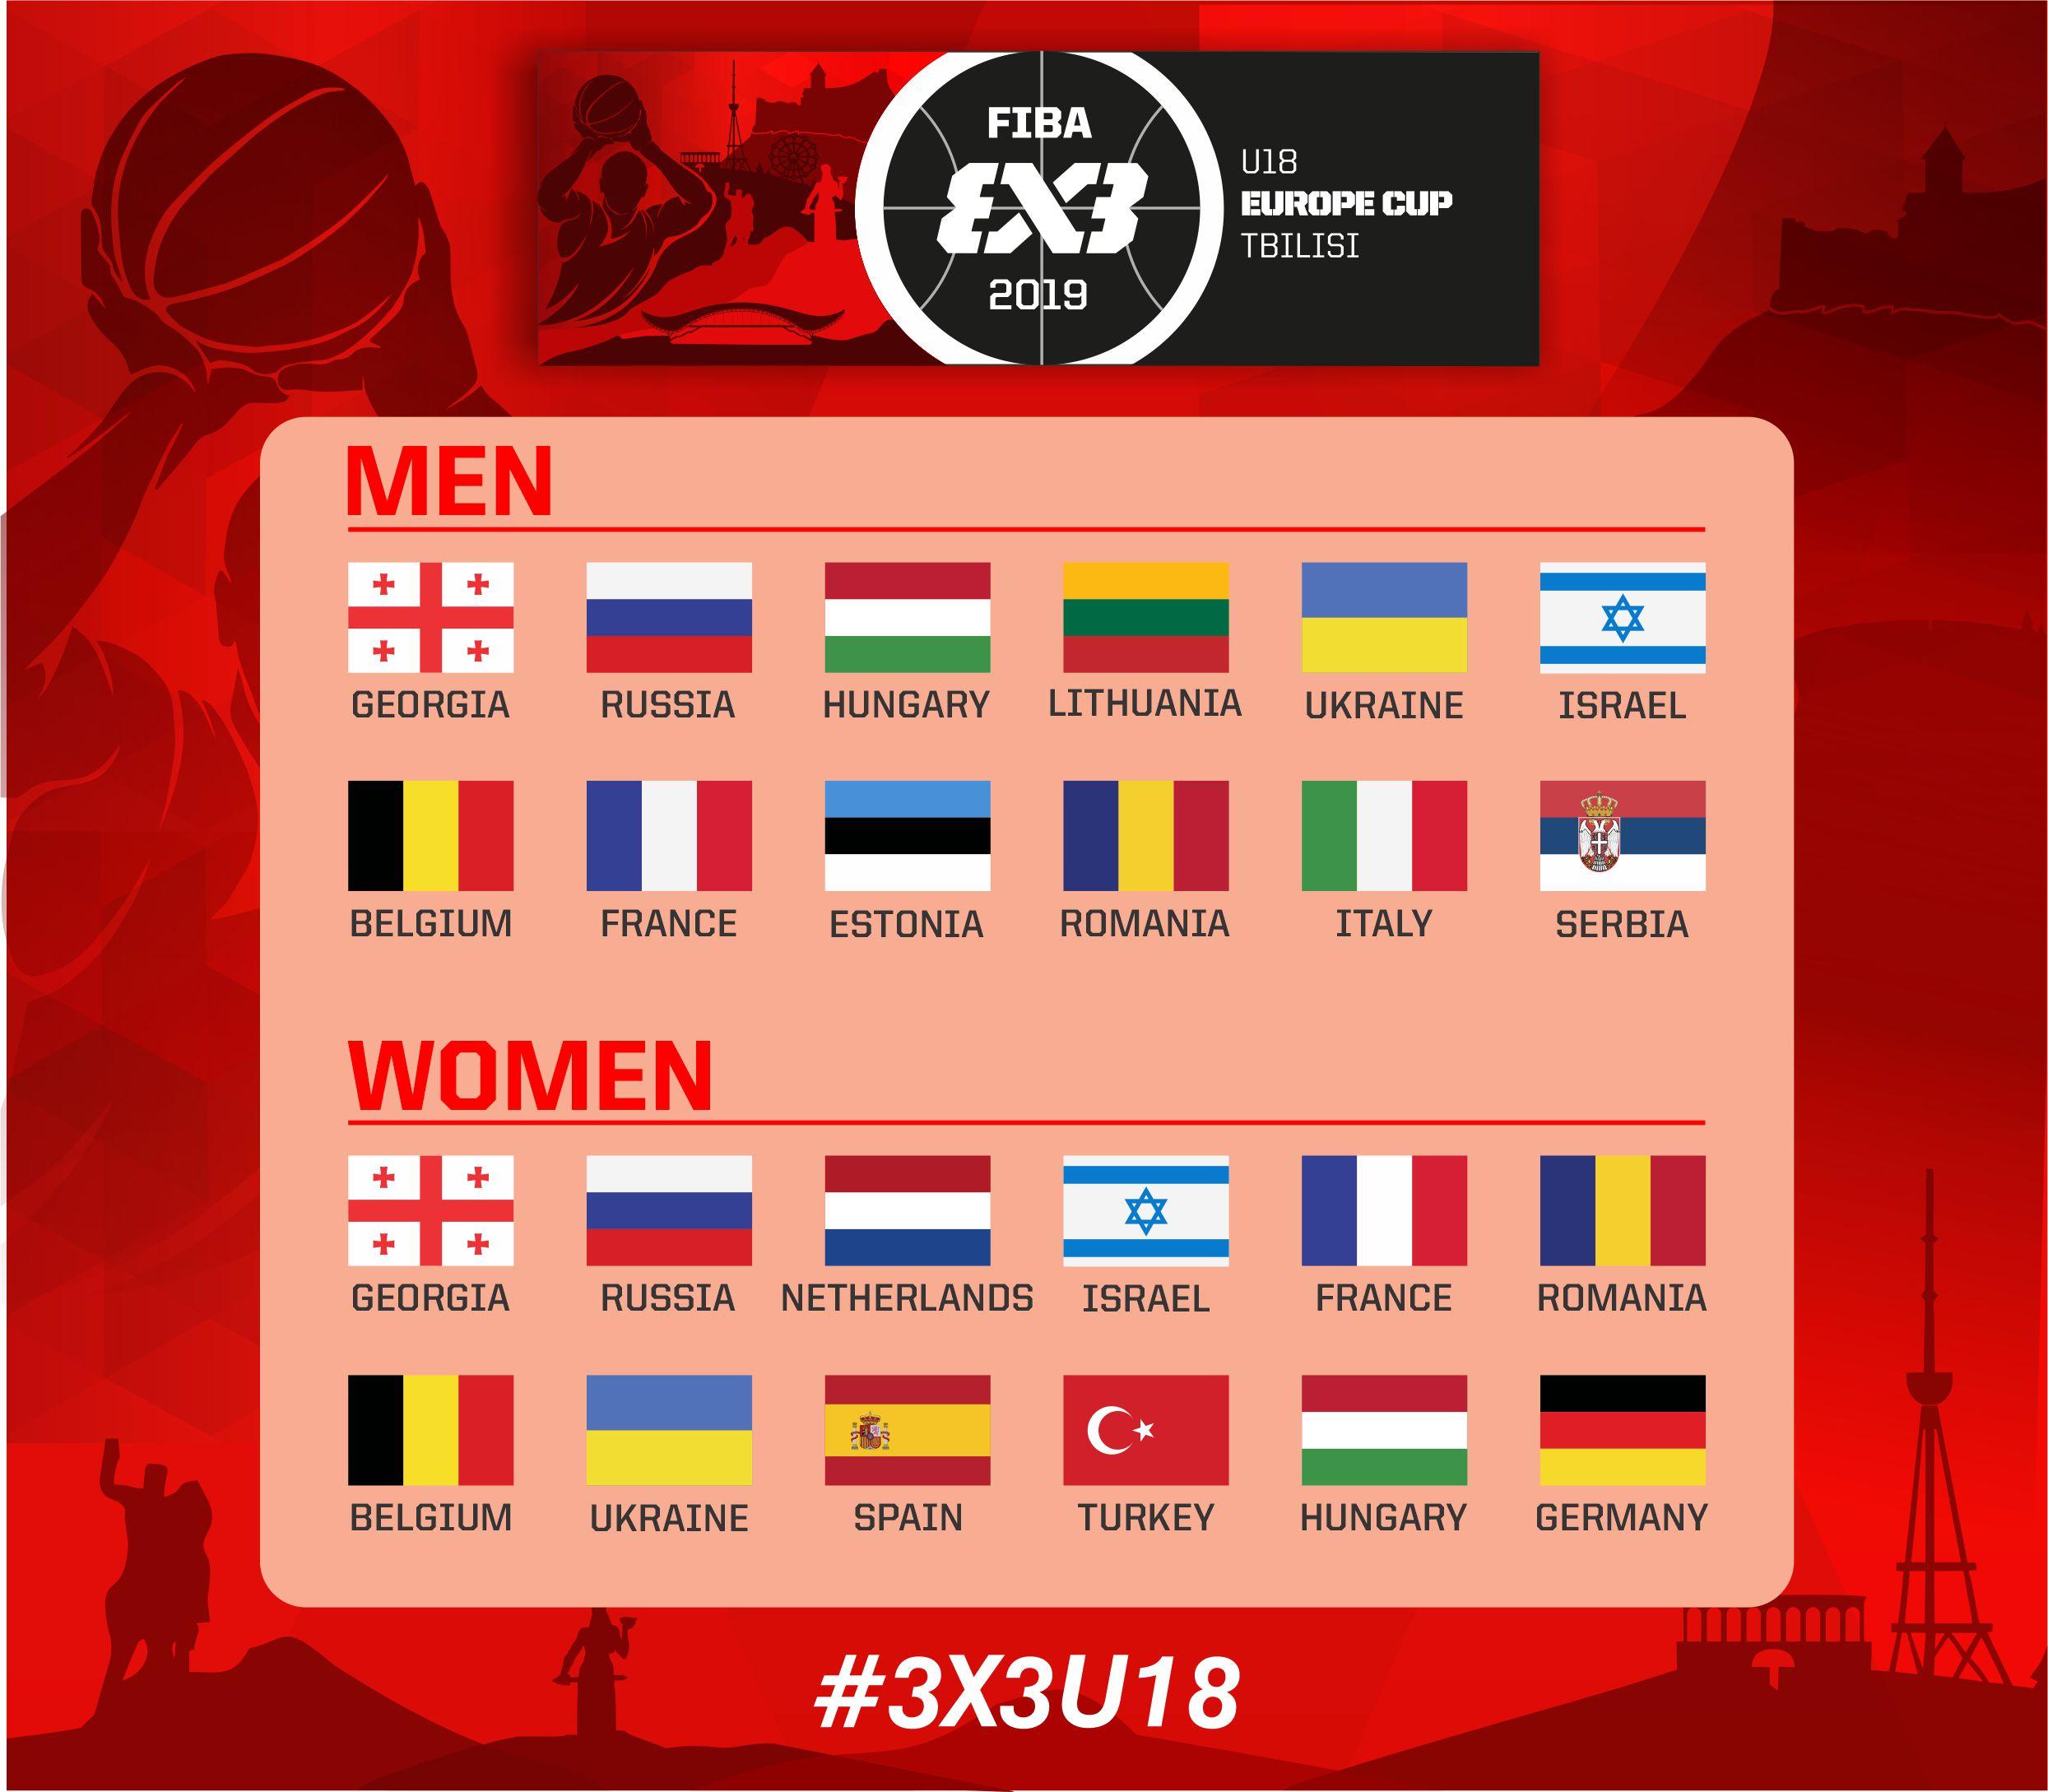 3X3 ევროპის თასის შესახებ!